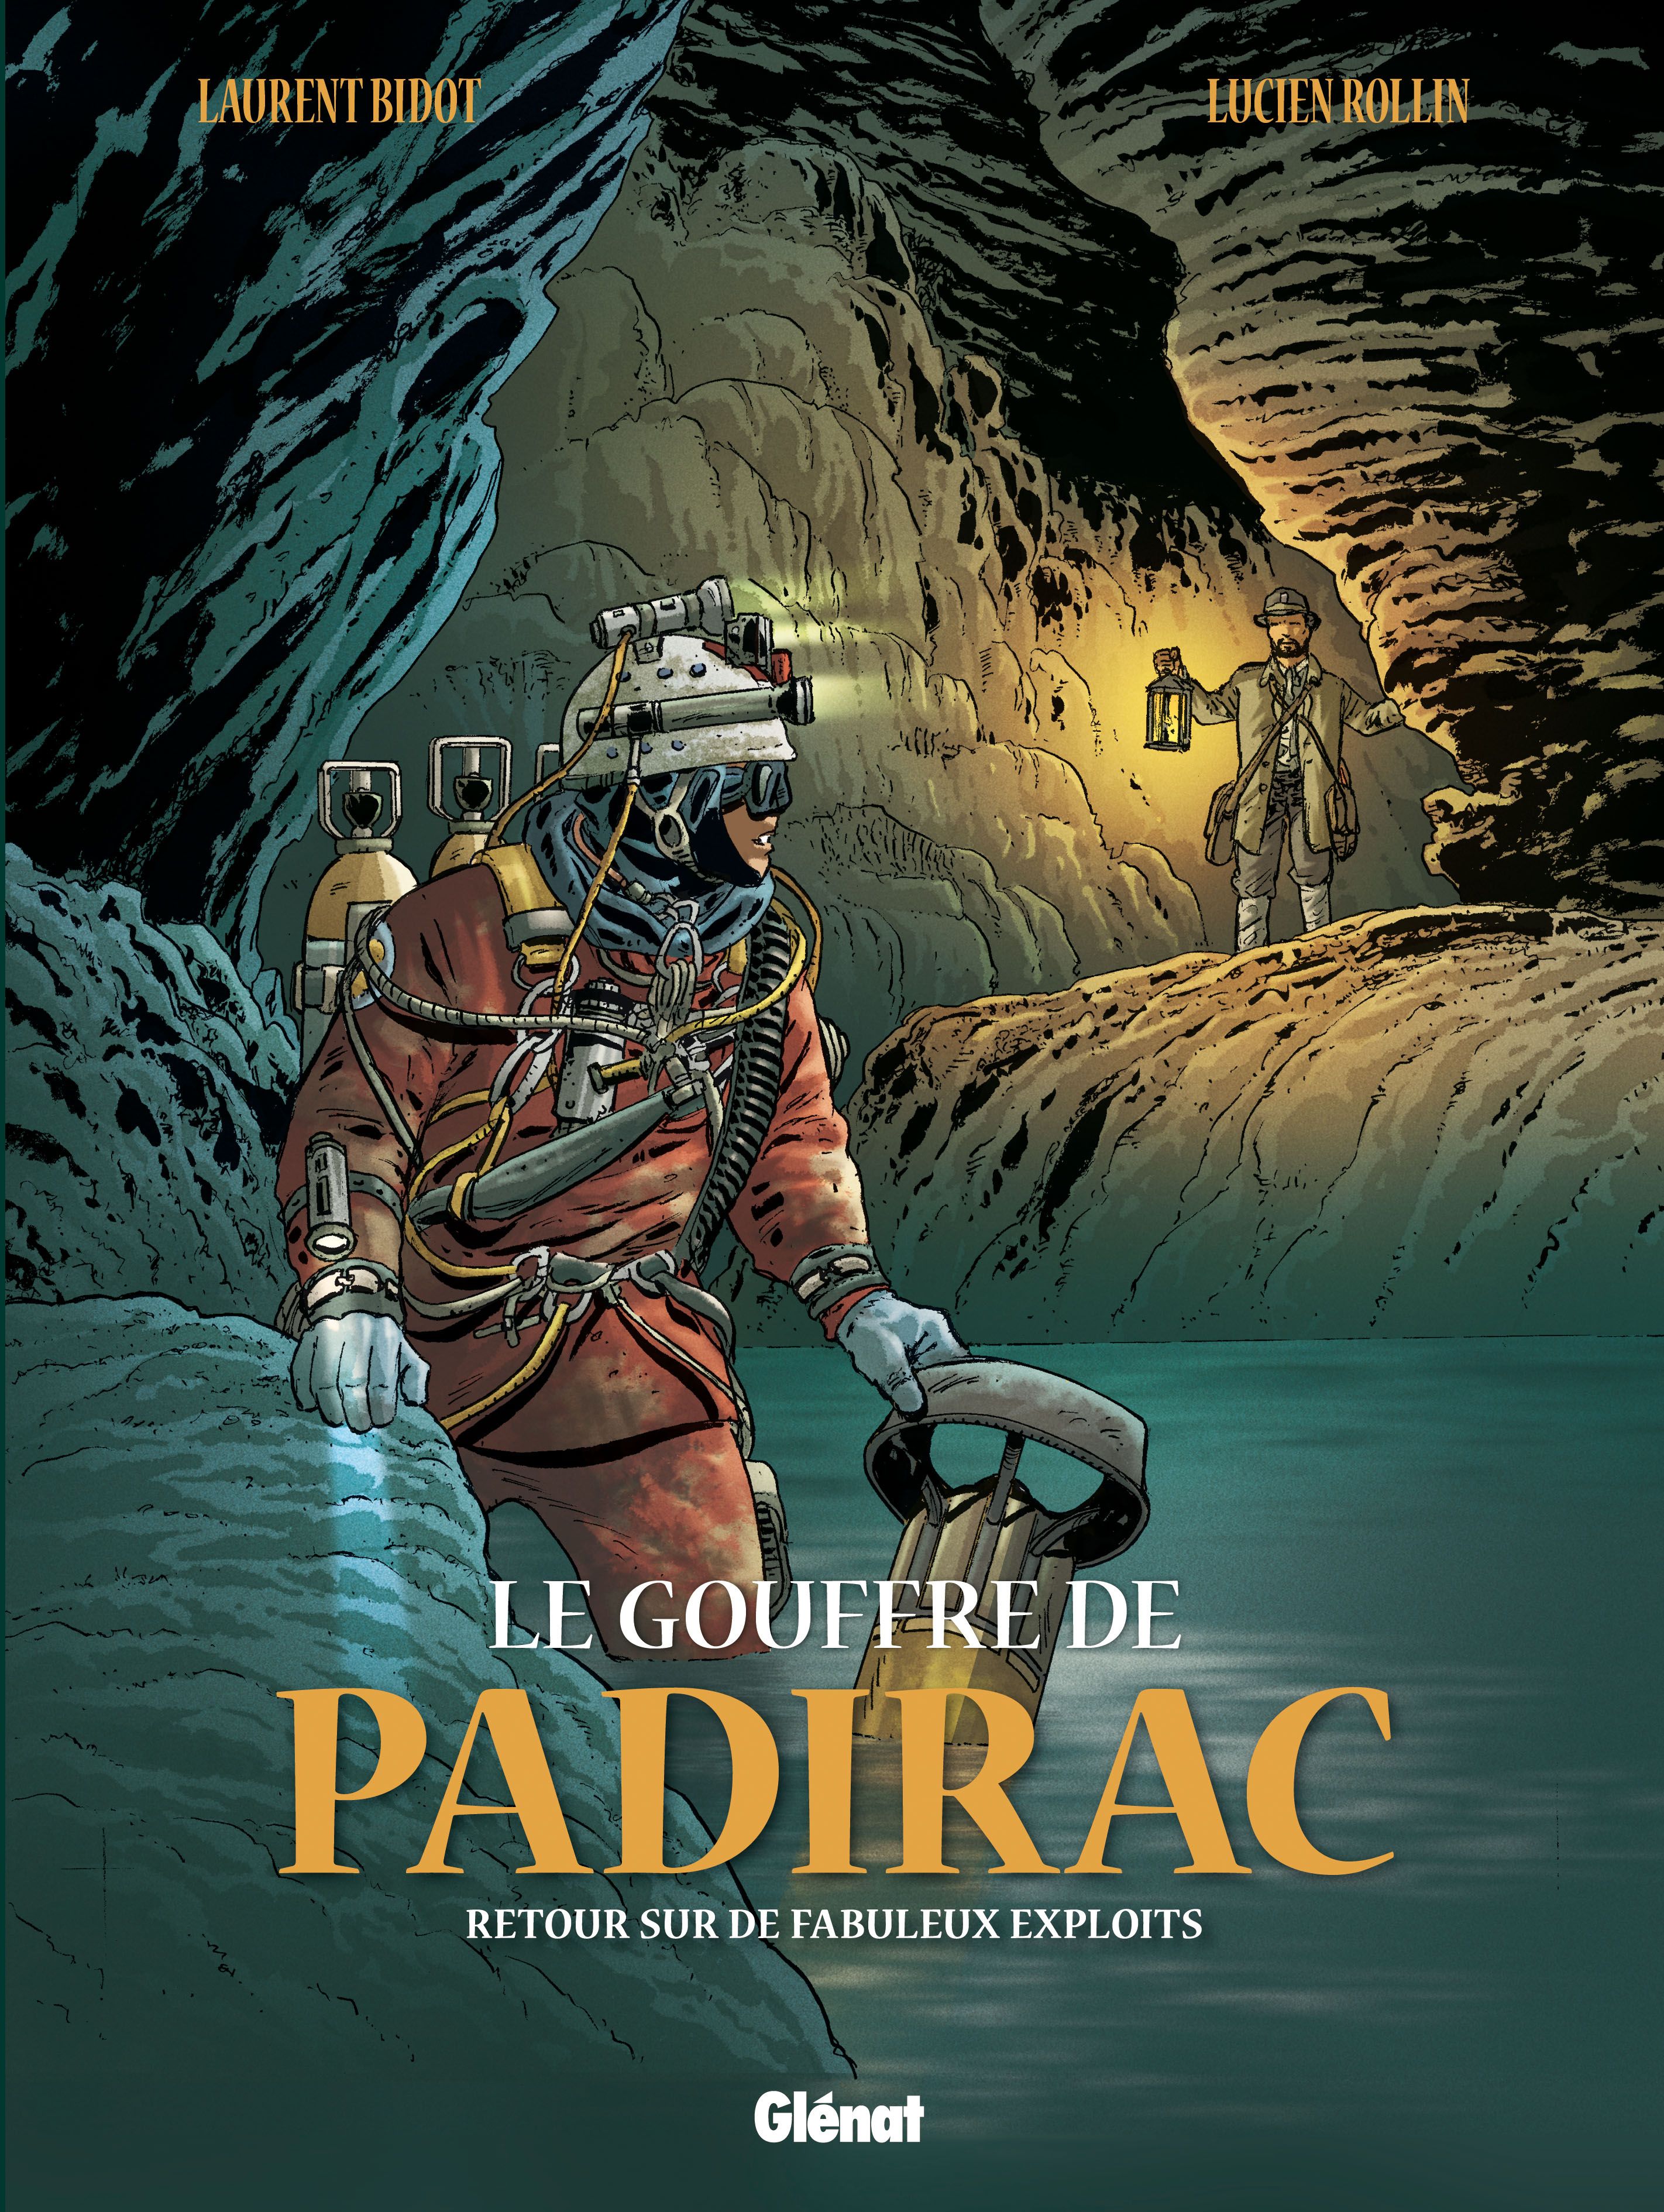 PADIRAC _3_cv1